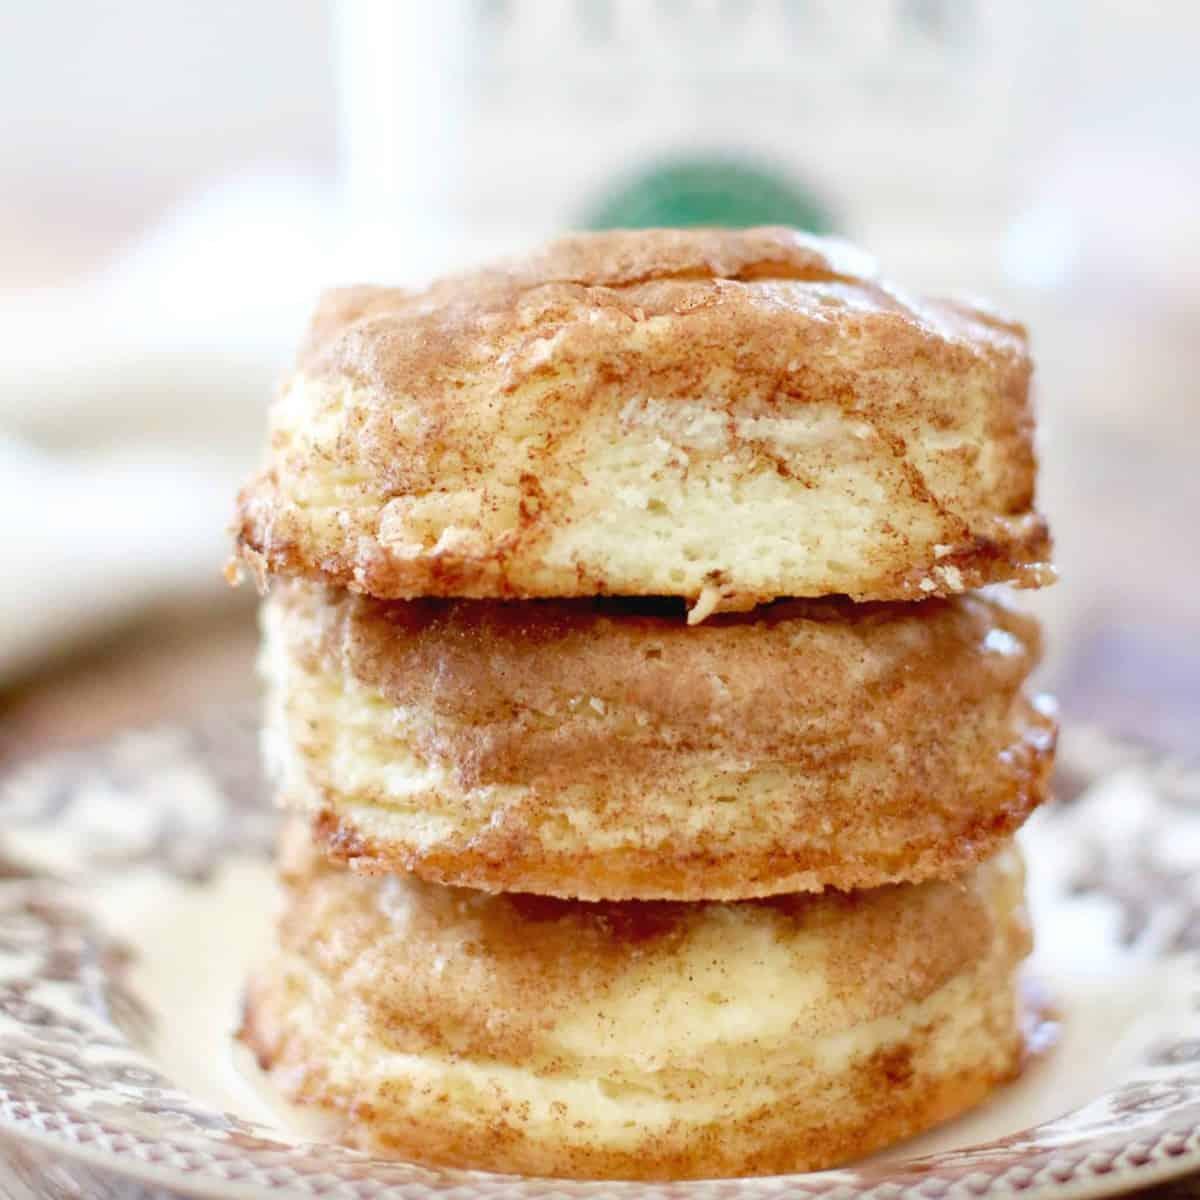 Homemade Snickerdoodle Skillet Biscuits